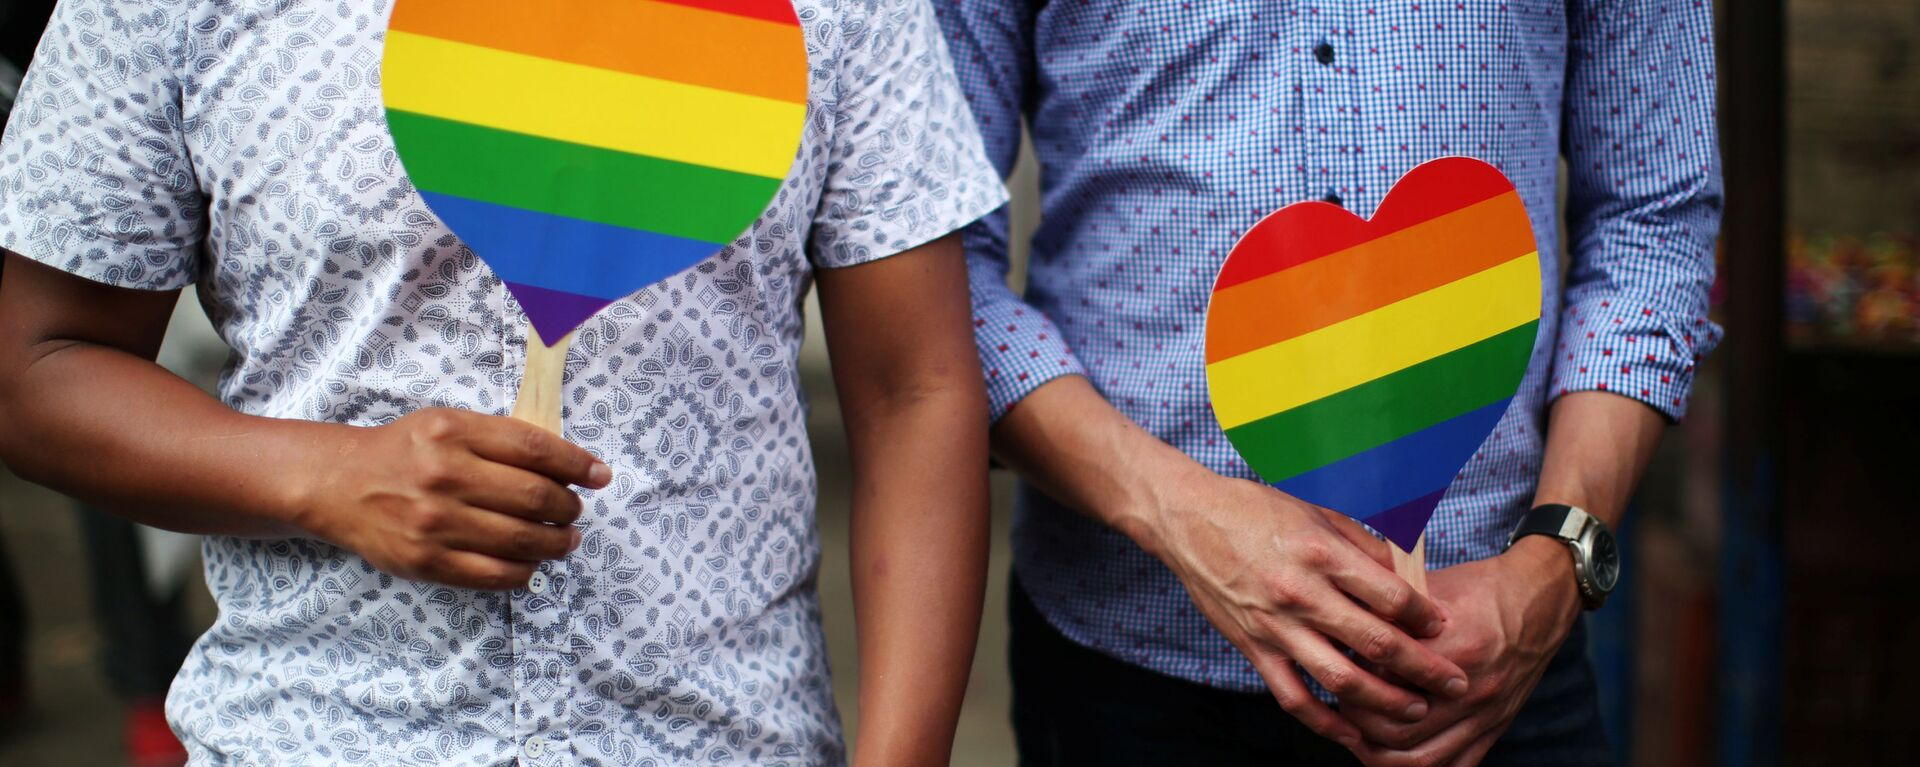 Gay Pride - Sputnik Italia, 1920, 04.07.2021